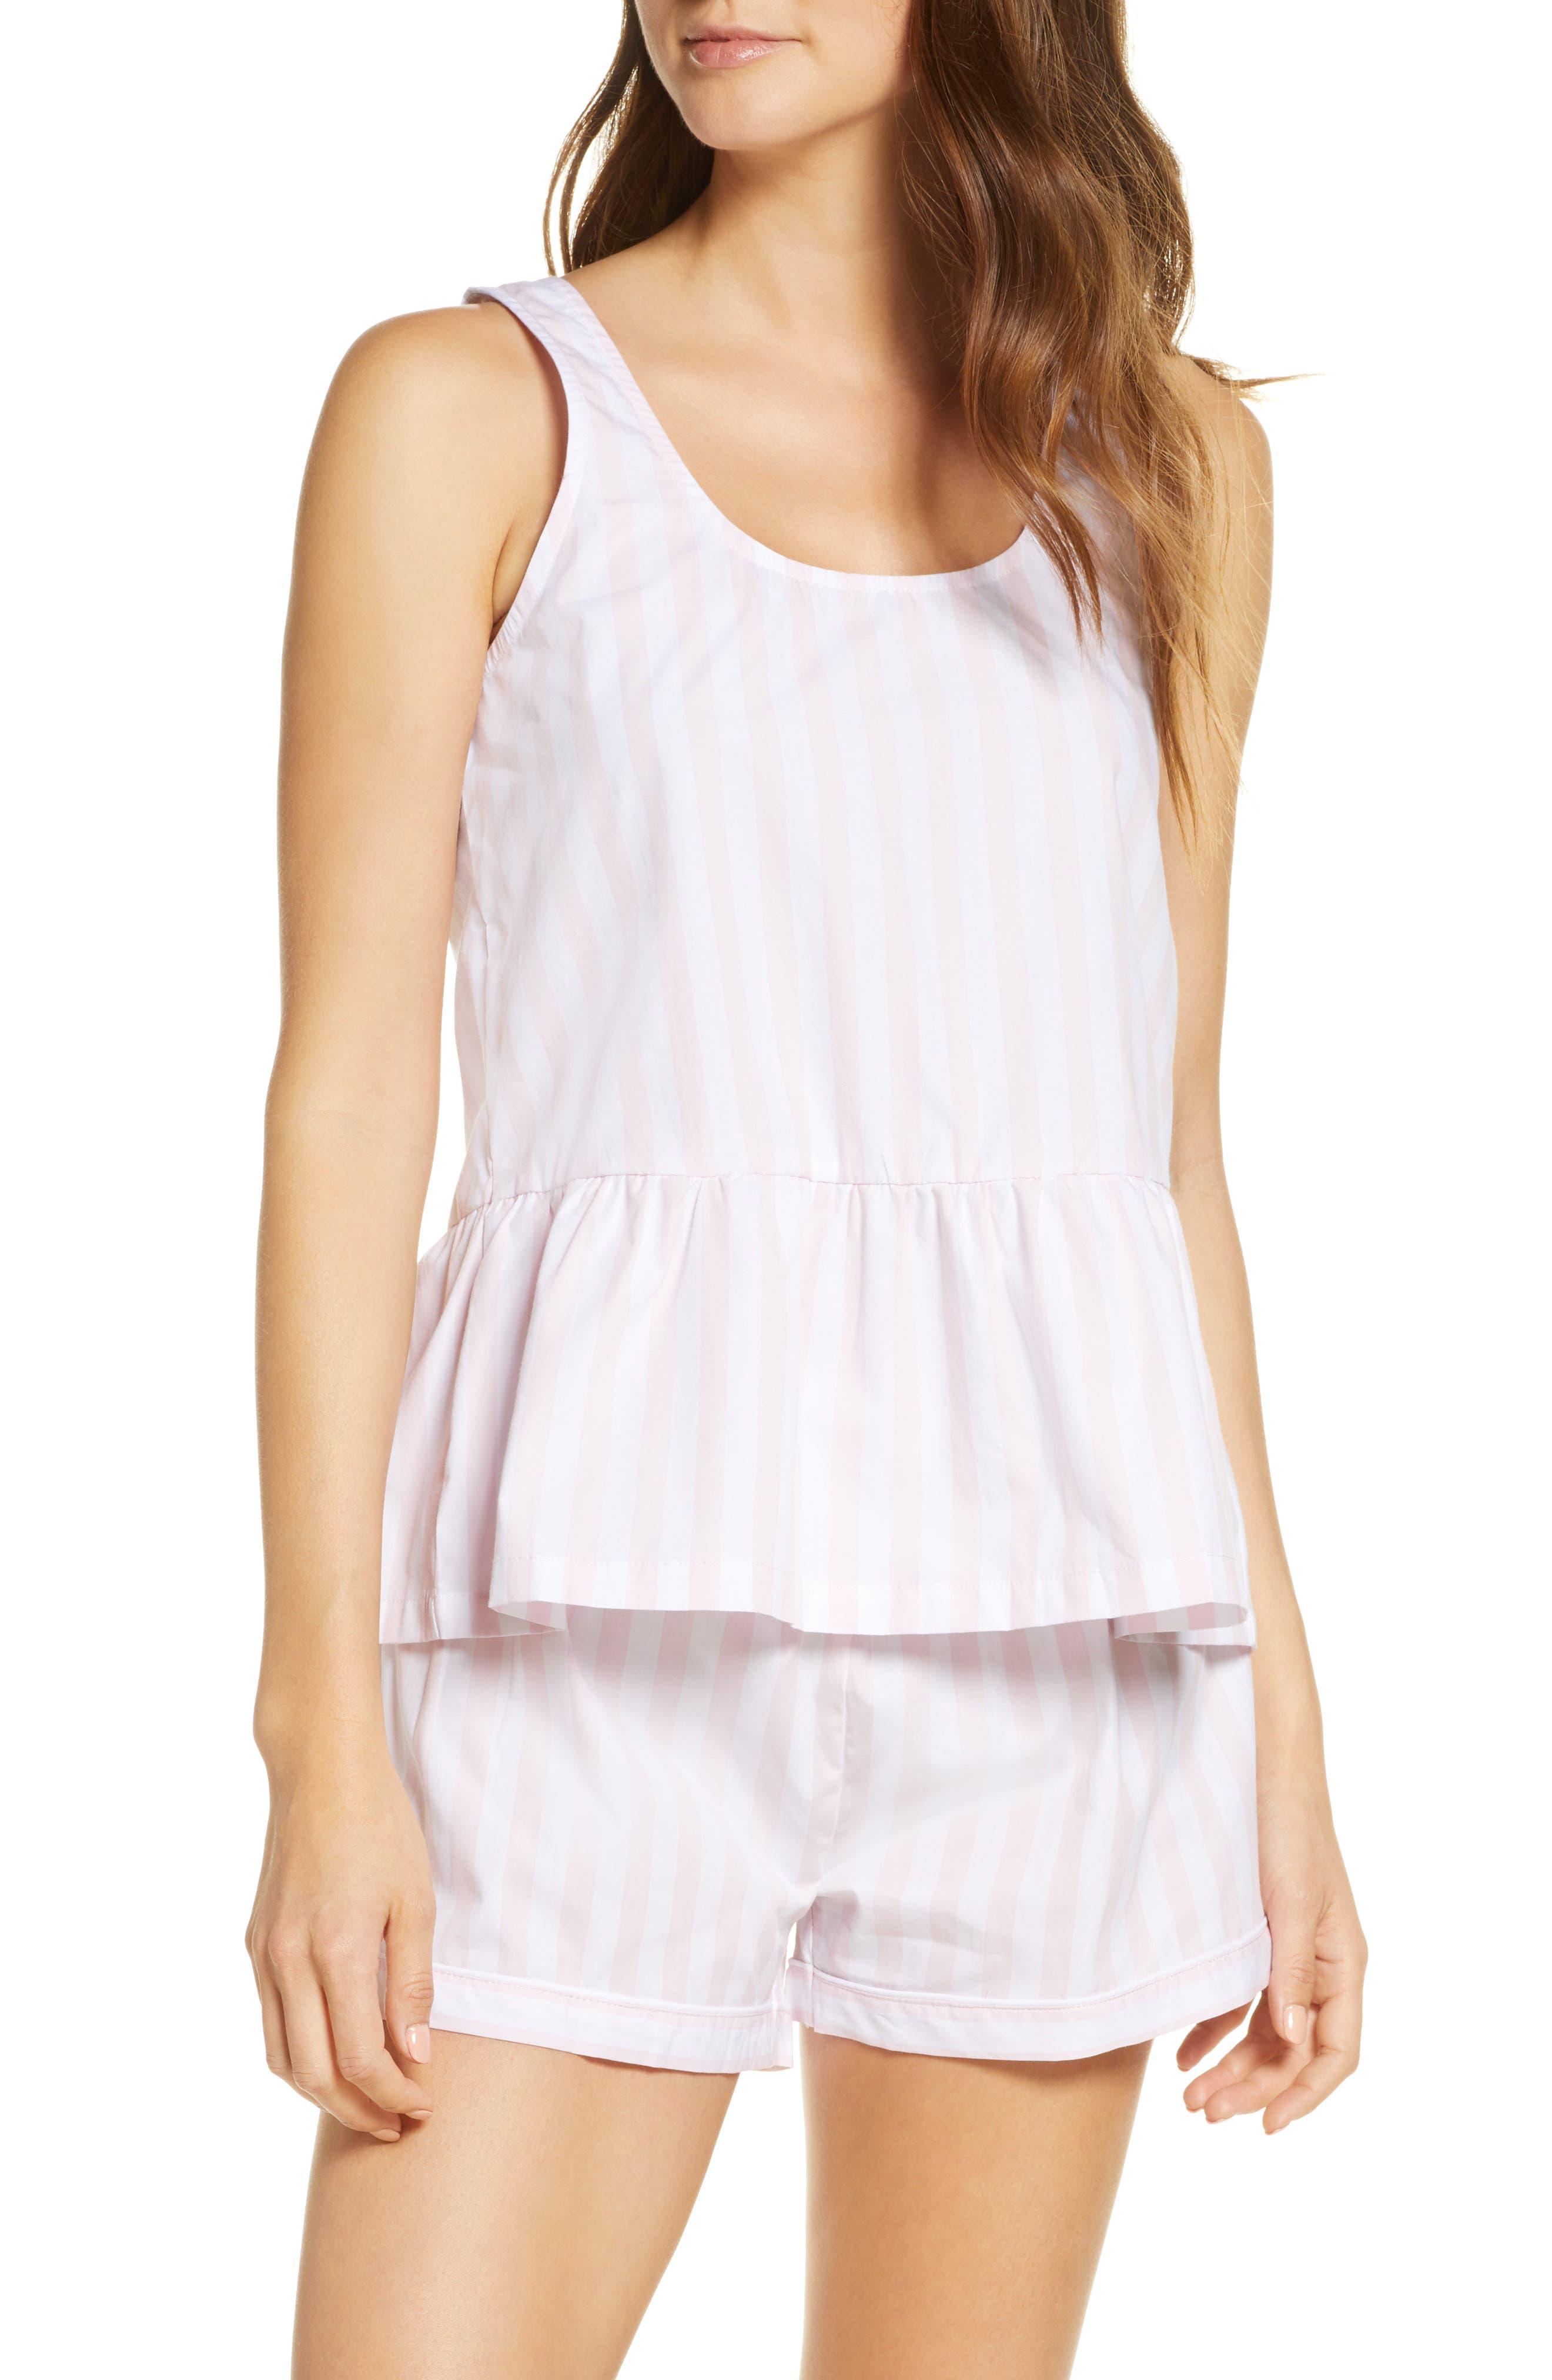 Retro Lingerie – Where to Shop Womens Sant And Abel Braddock Stripe Peplum Short Pajamas $125.00 AT vintagedancer.com